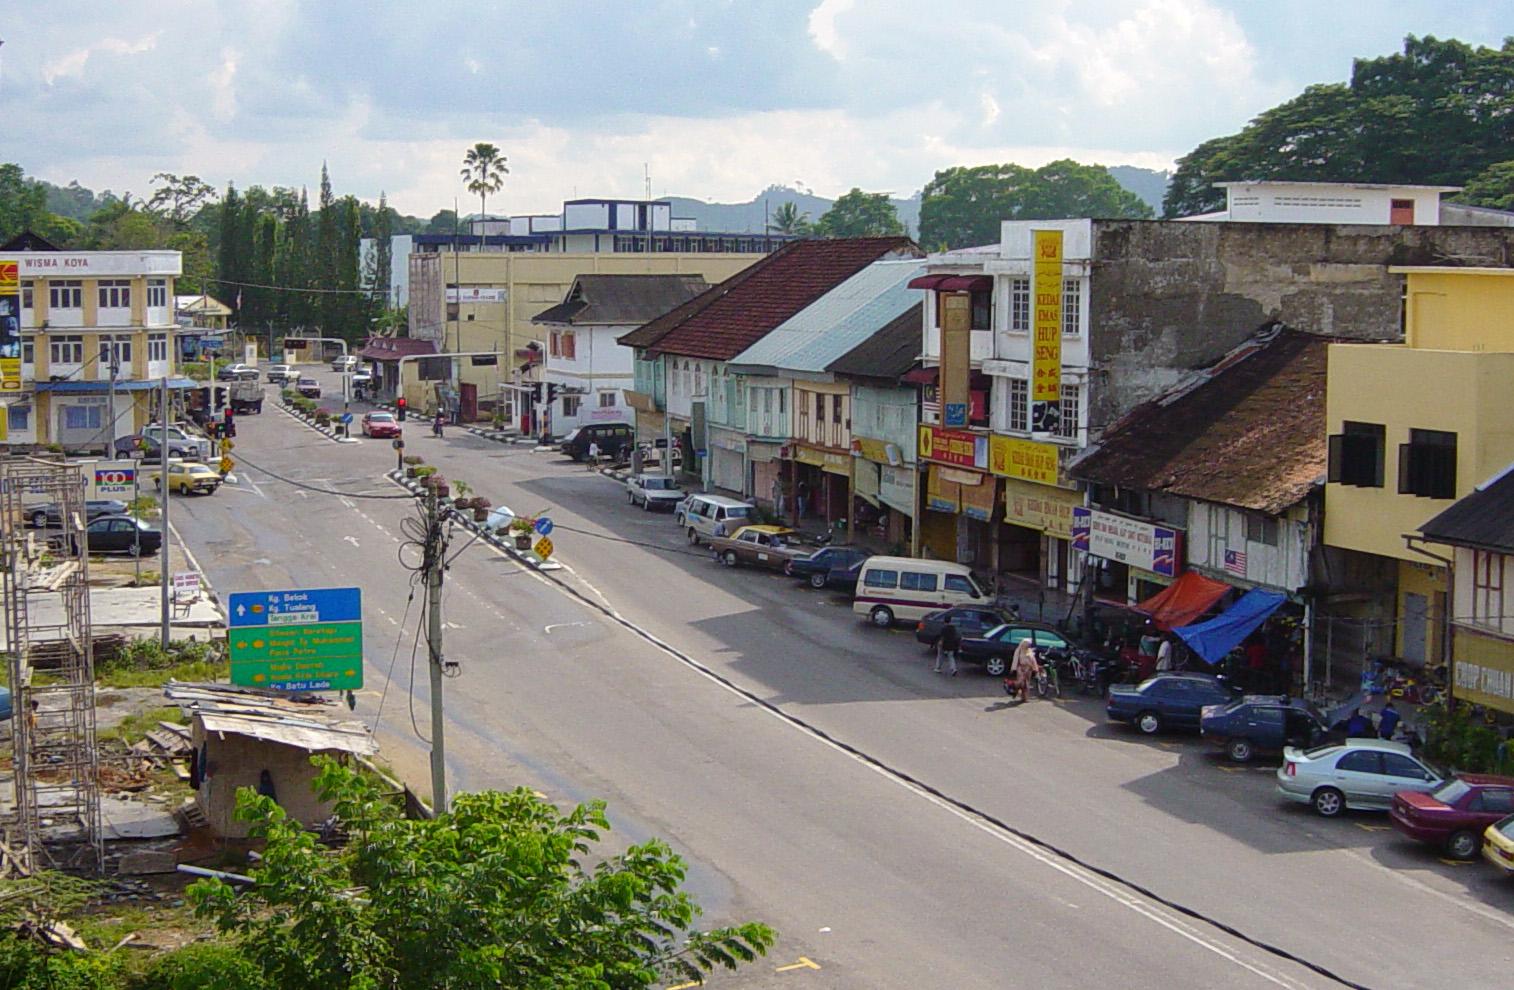 Kuala Krai Malaysia  city photos gallery : kuala perlis, Perlis, Malaysia What happens in kuala perlis right ...